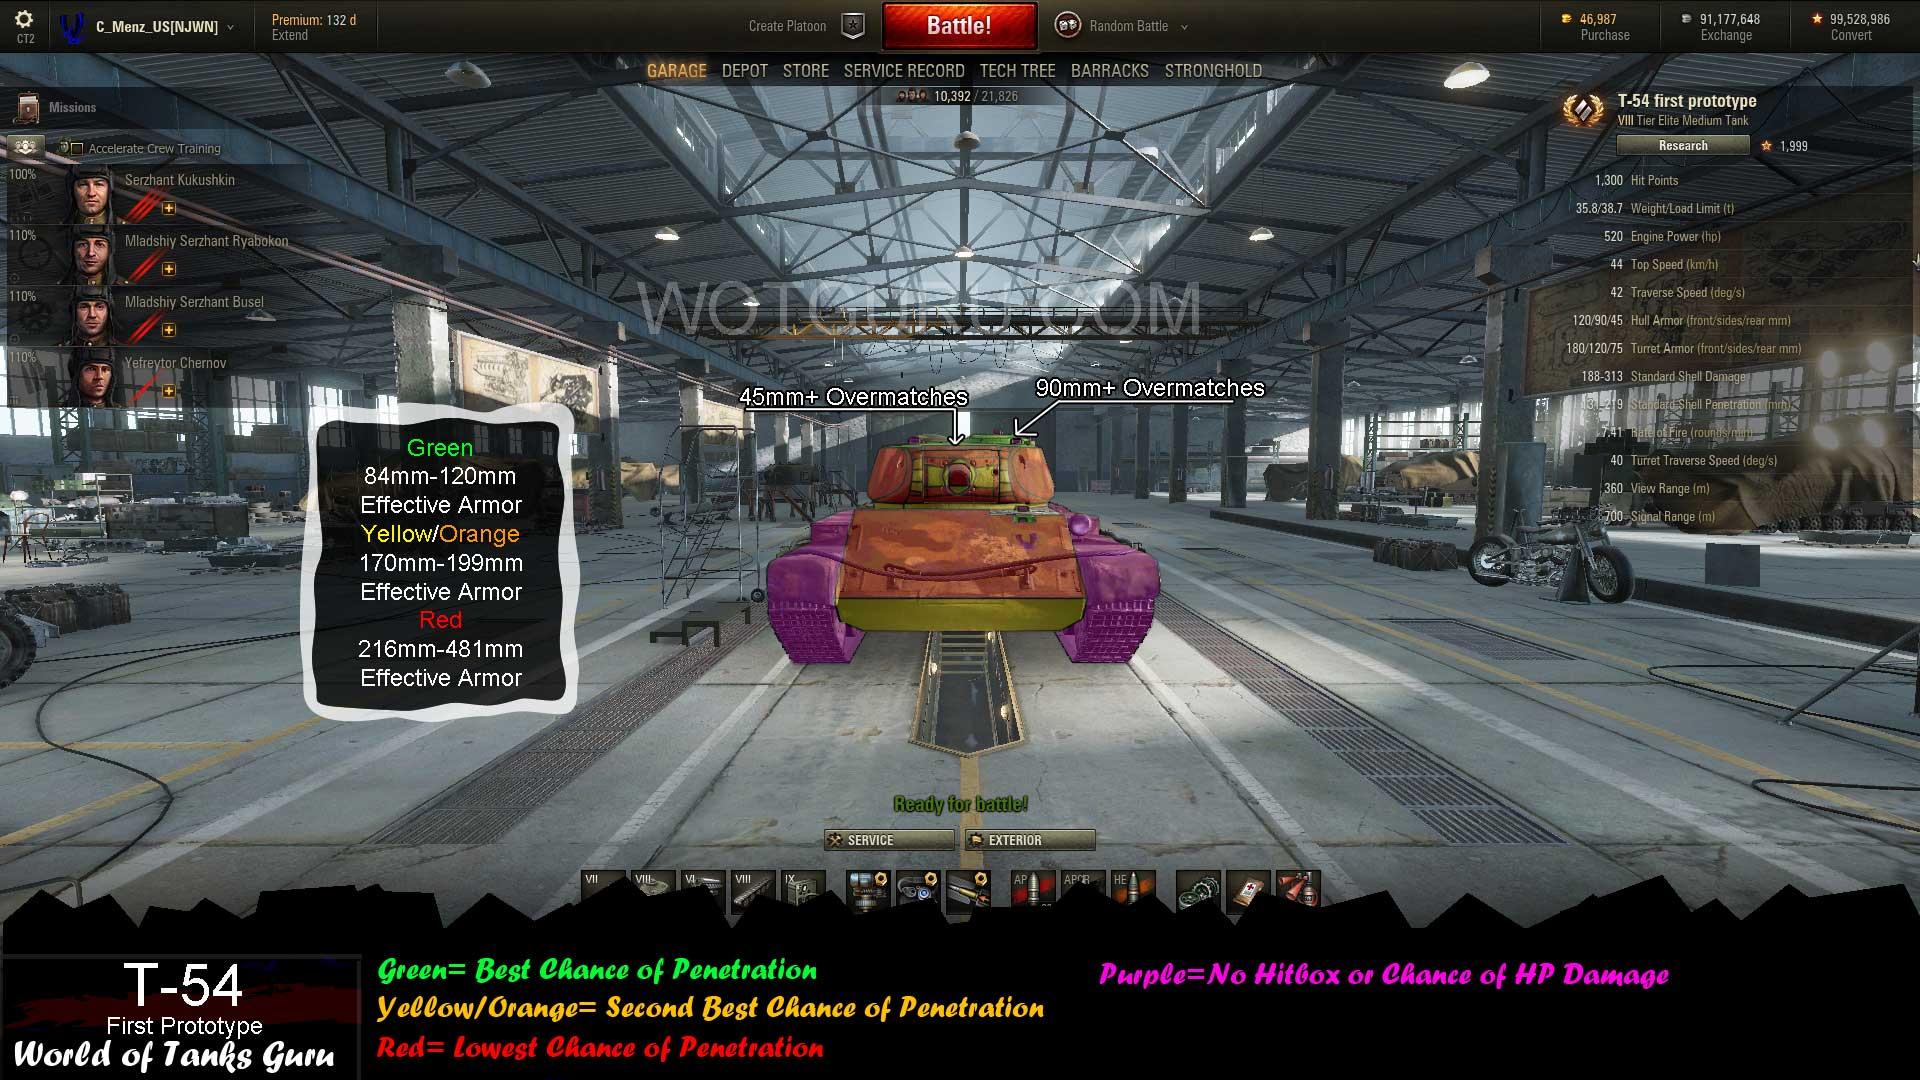 world of tanks matchmaking mod